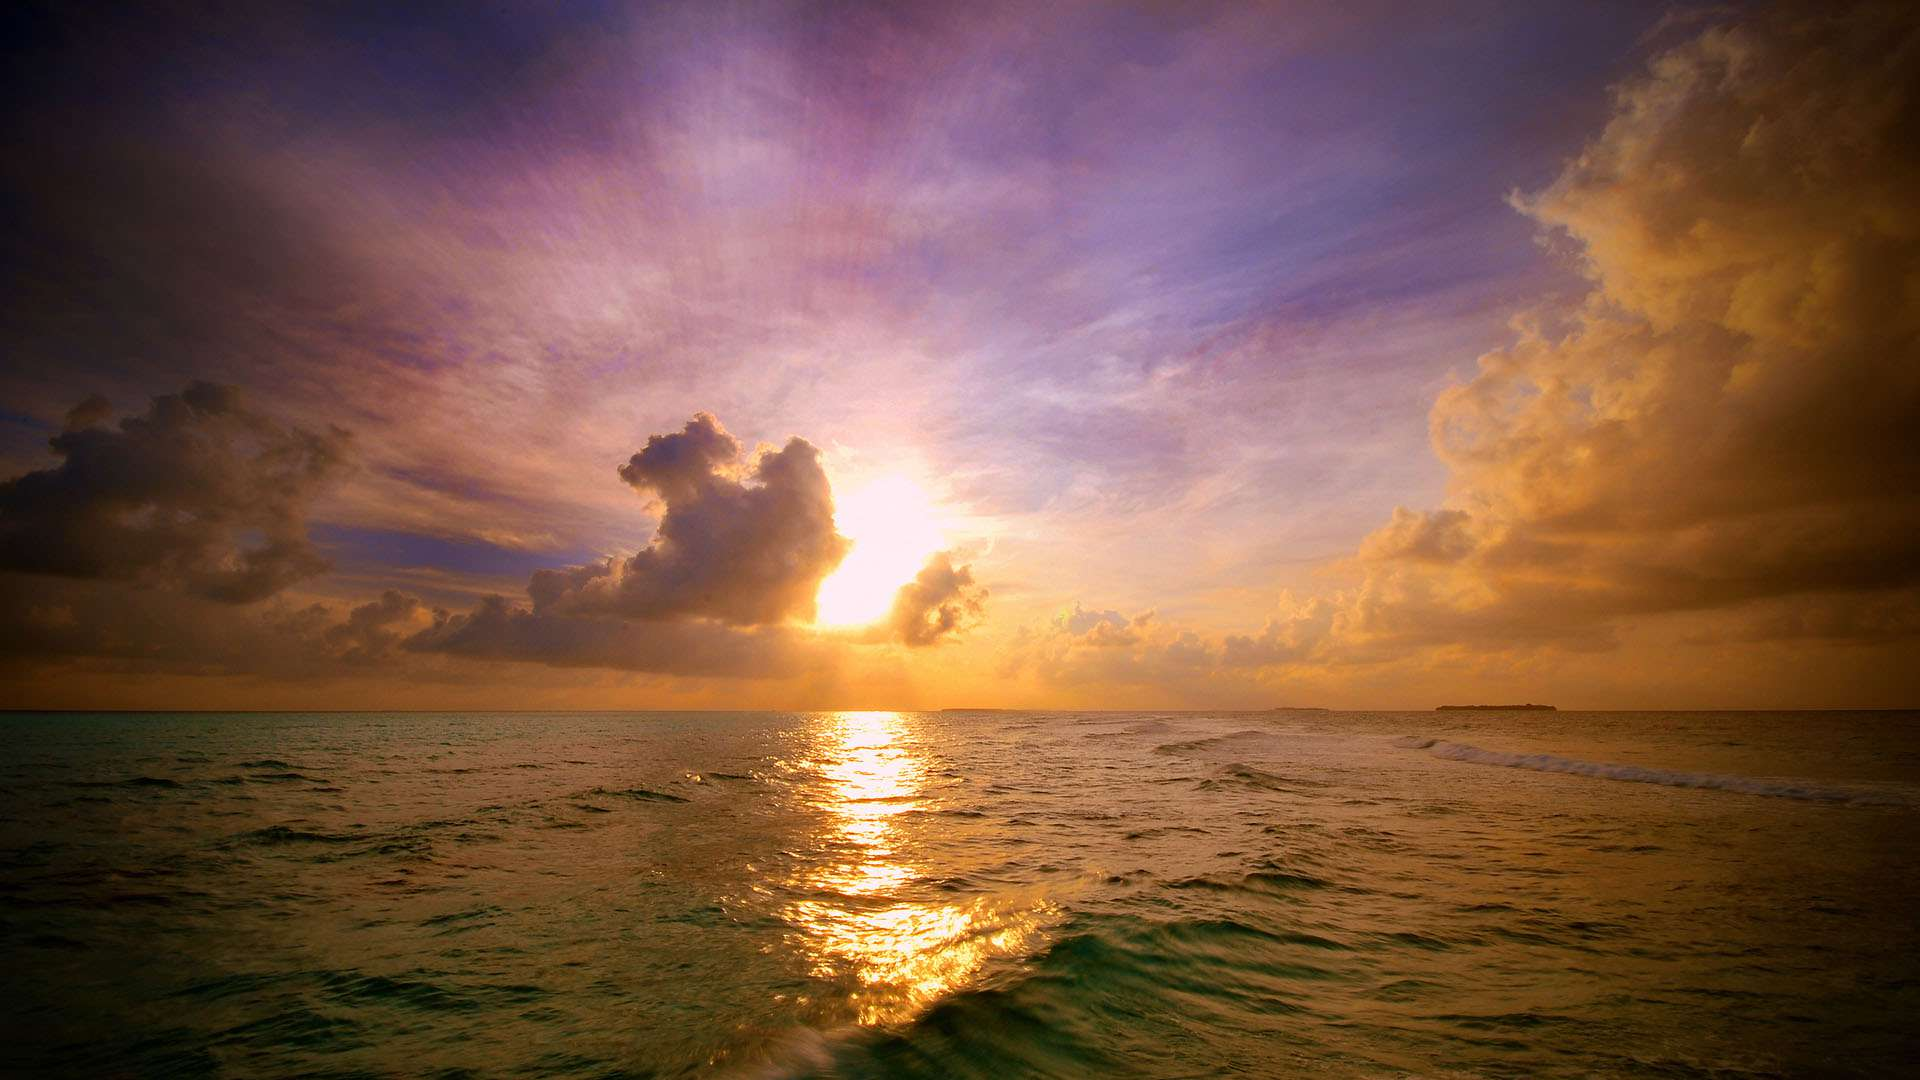 13 Free Ocean Wallpapers For Your Desktop or Phone